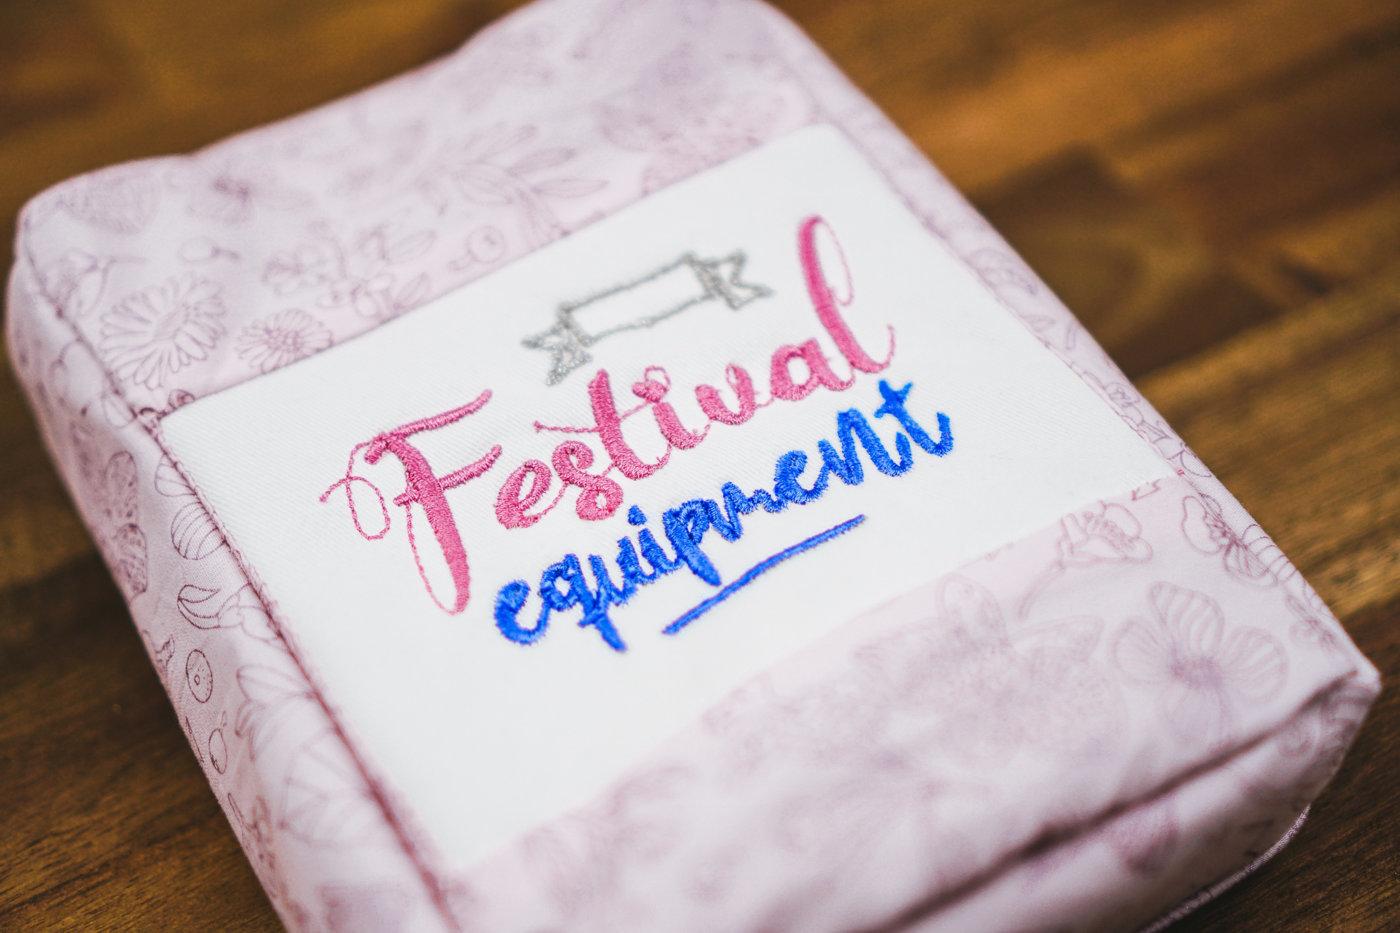 Festival Stickdatei